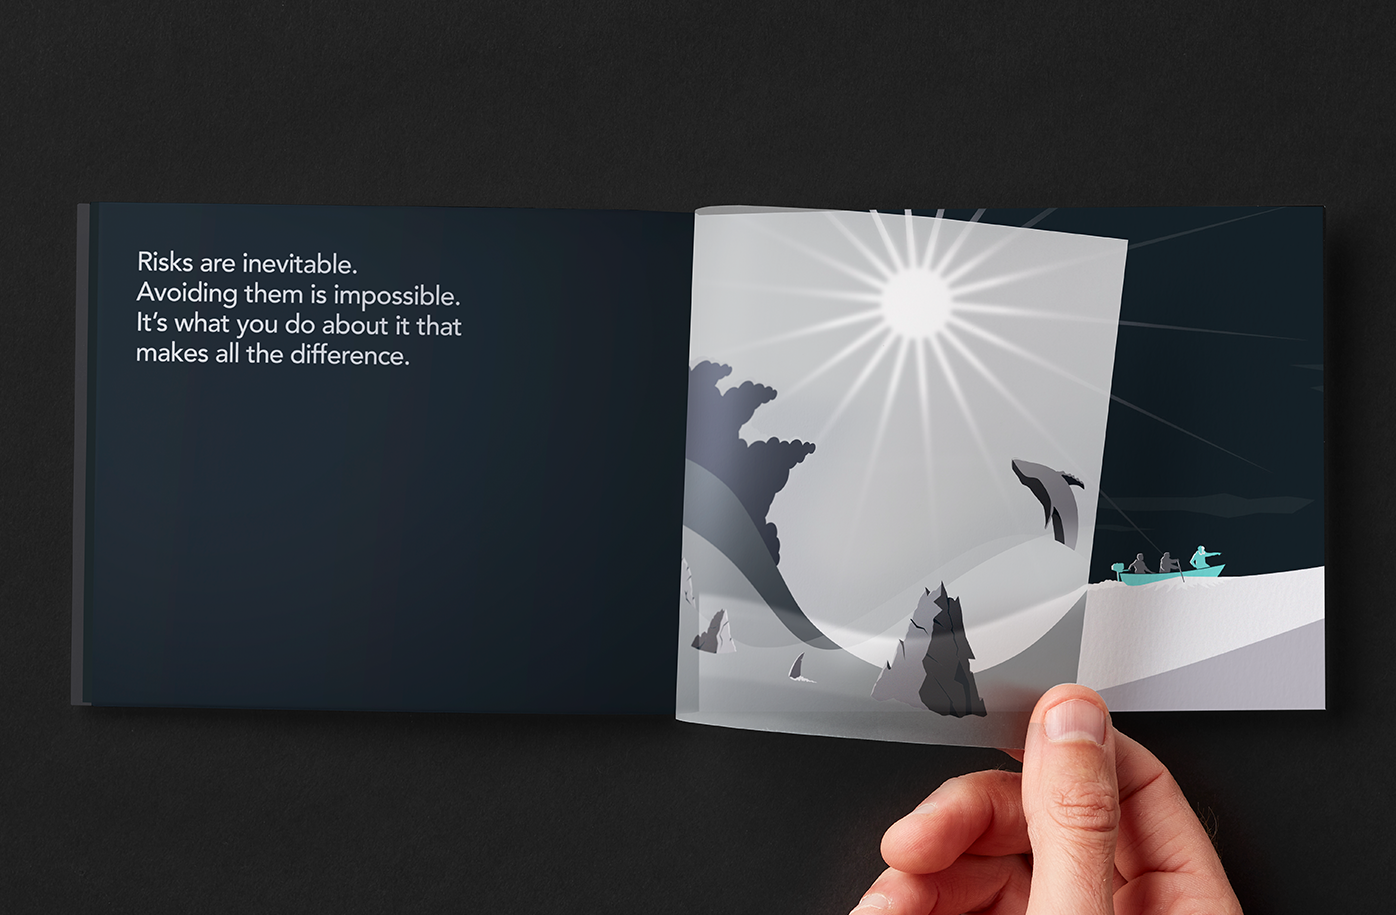 Illustration of team navigating through commodities markets on brochure spread